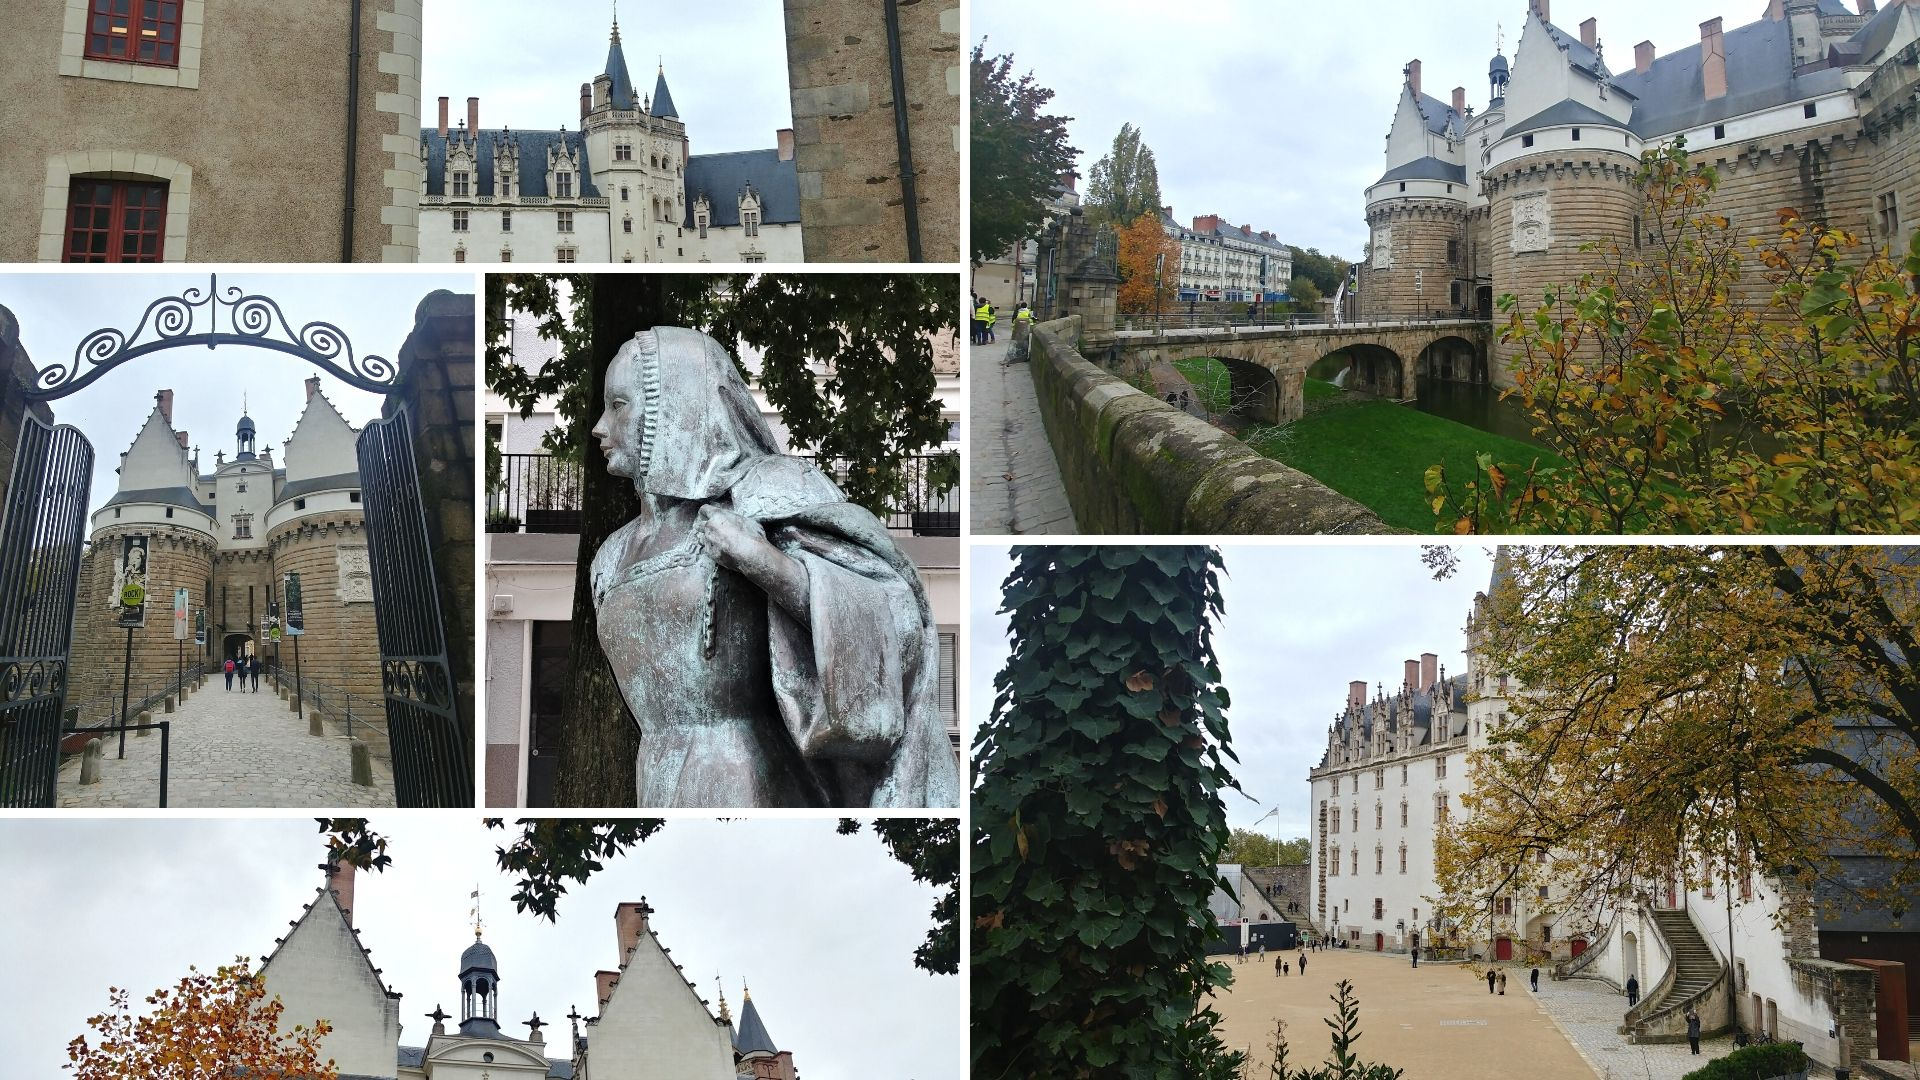 nantes chateau musee visite blog voyage france arpenter le chemin